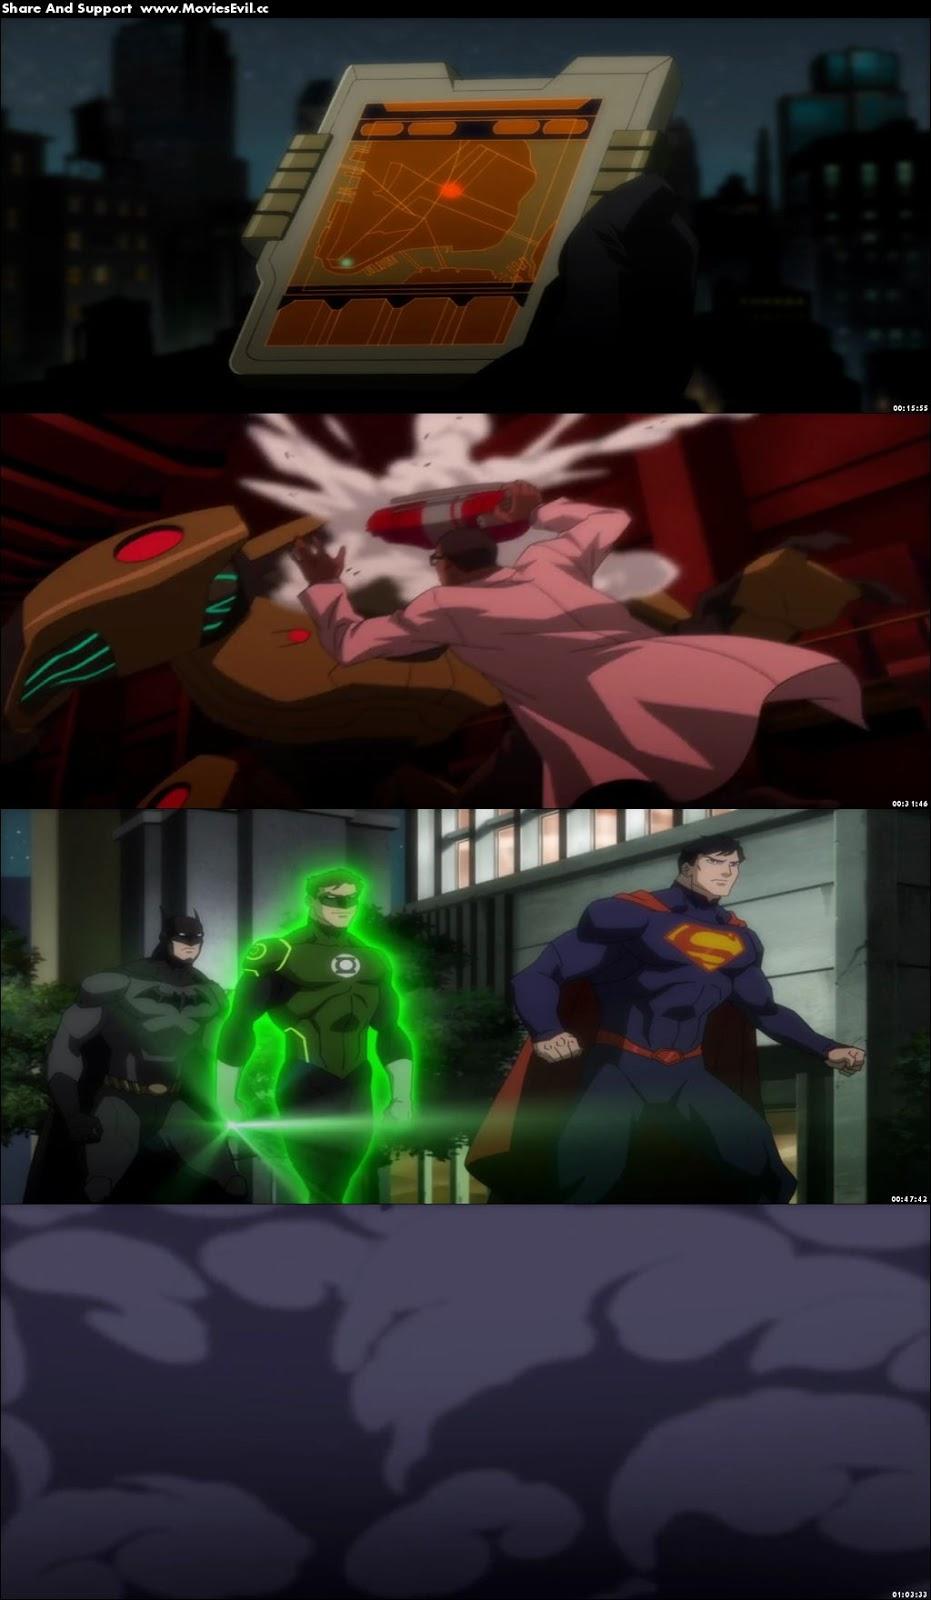 Justice League War 2014 torrent download,Justice League War 2014 watch online hindi dubbed,Justice League War 2014 300 mb download,Justice League War 2014 dual audio download,Justice League War 2014 direct link download